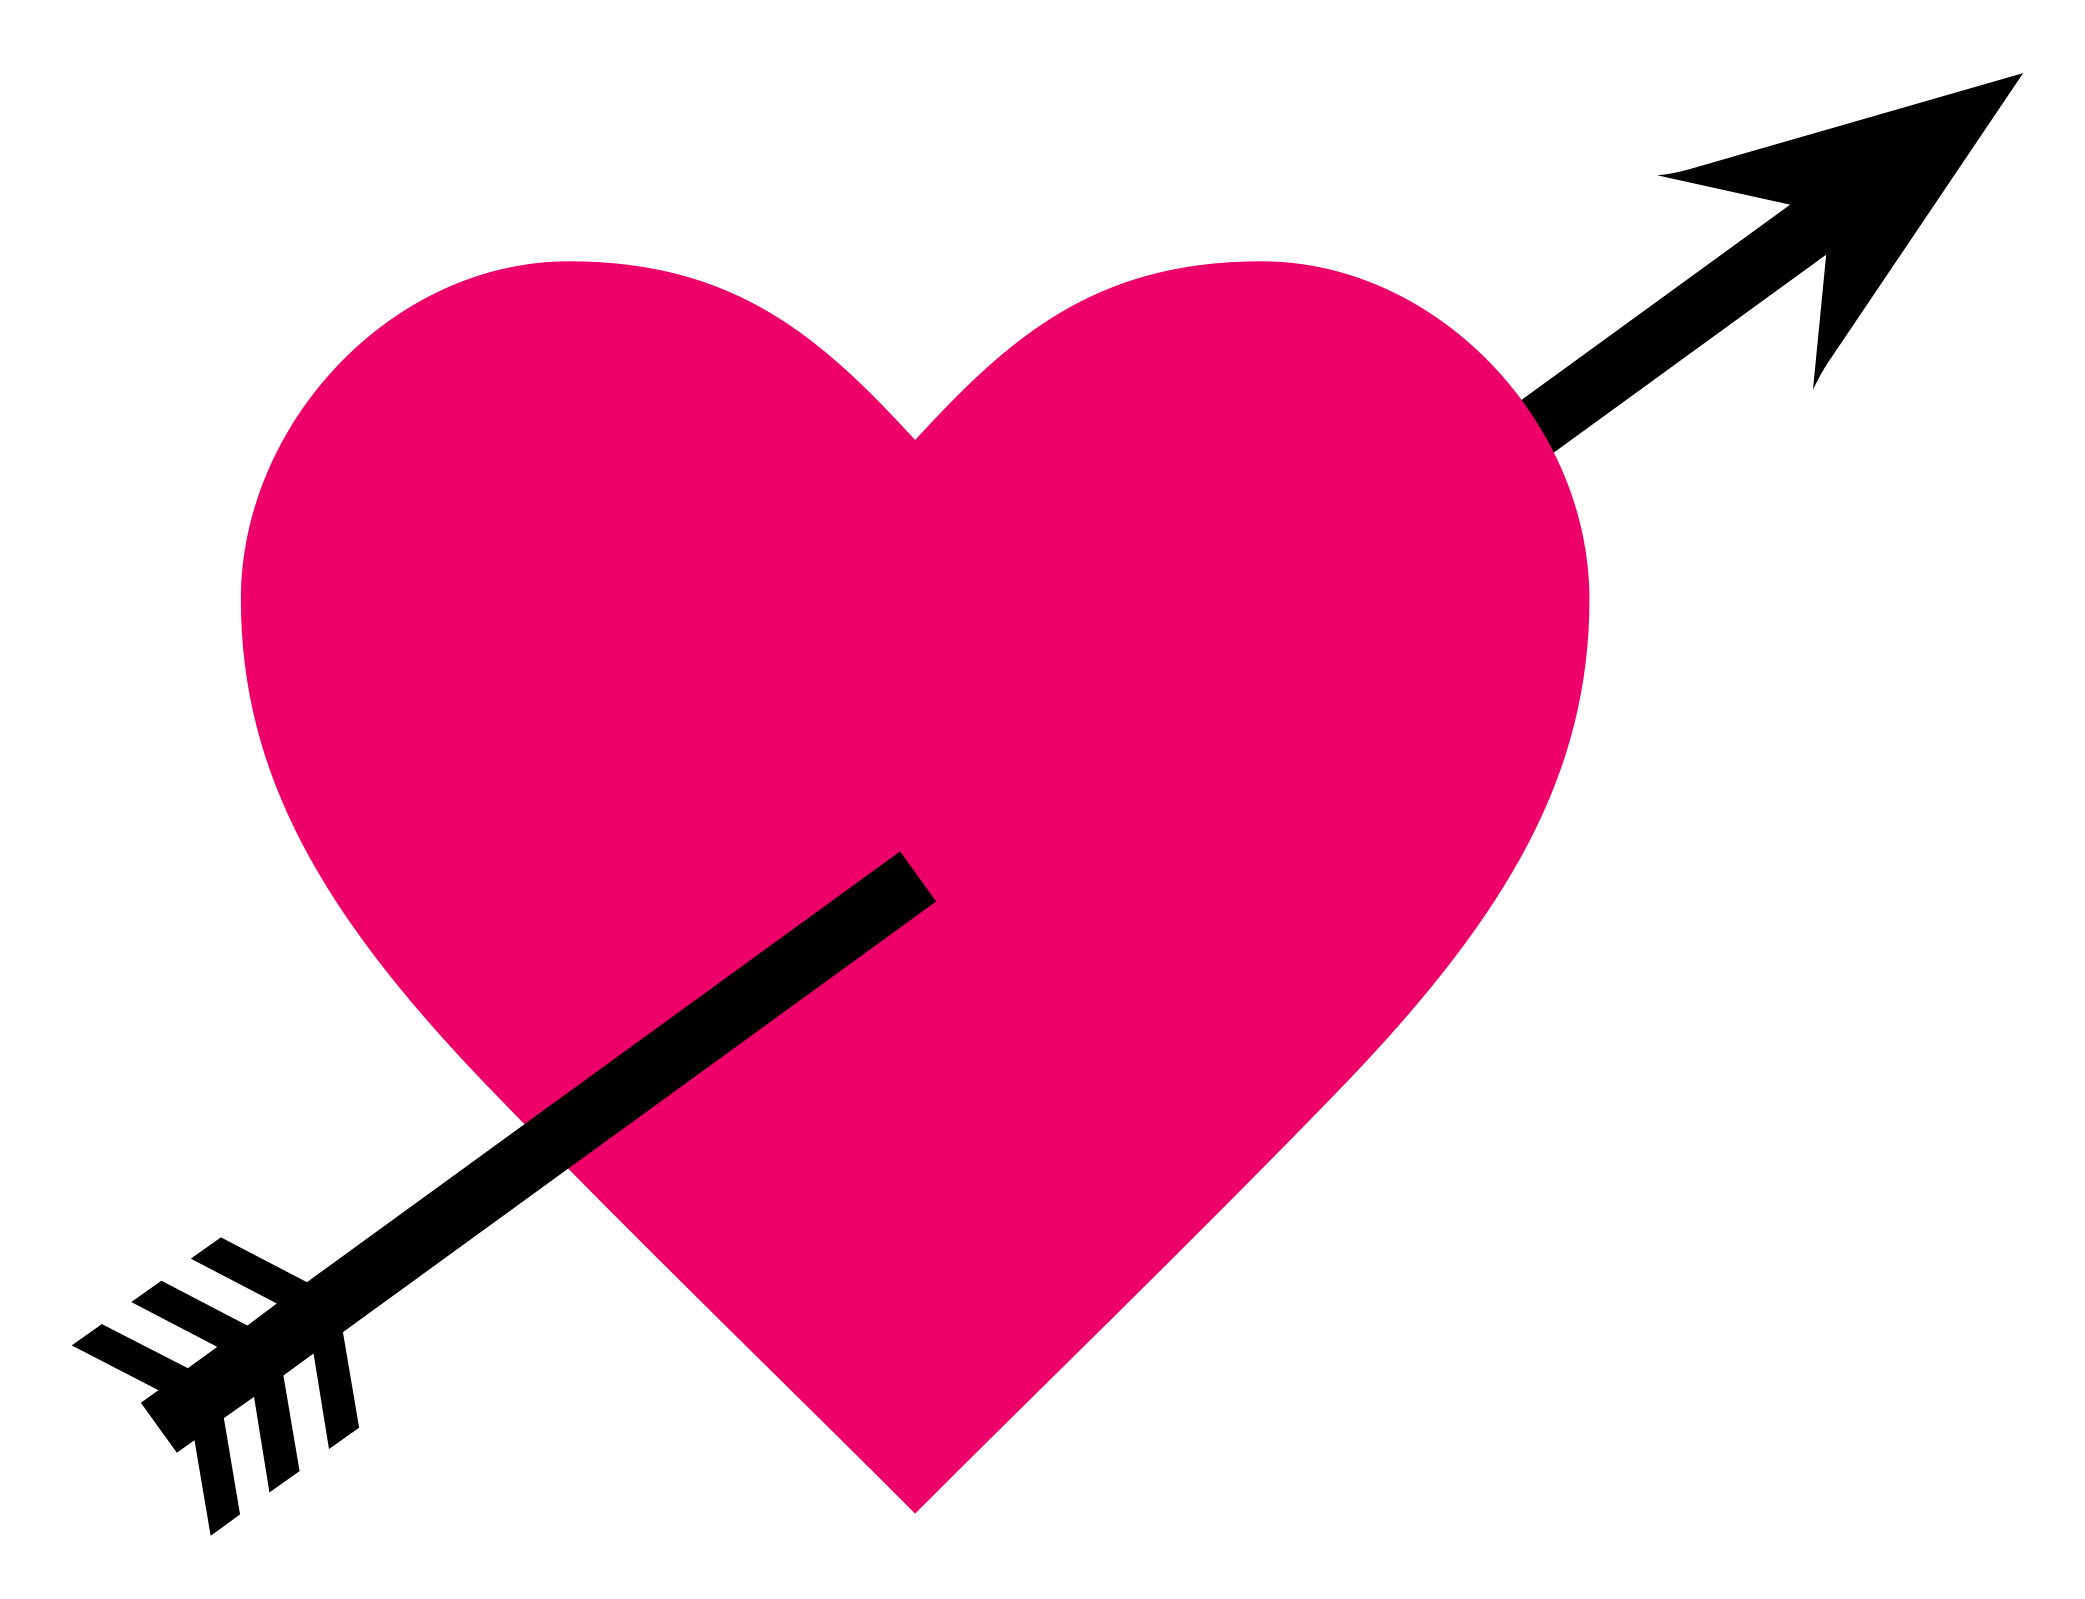 Heart arrow clip art png download Heart Love Arrow Clip art - PINK HEARTS 2085*1599 transprent Png ... png download